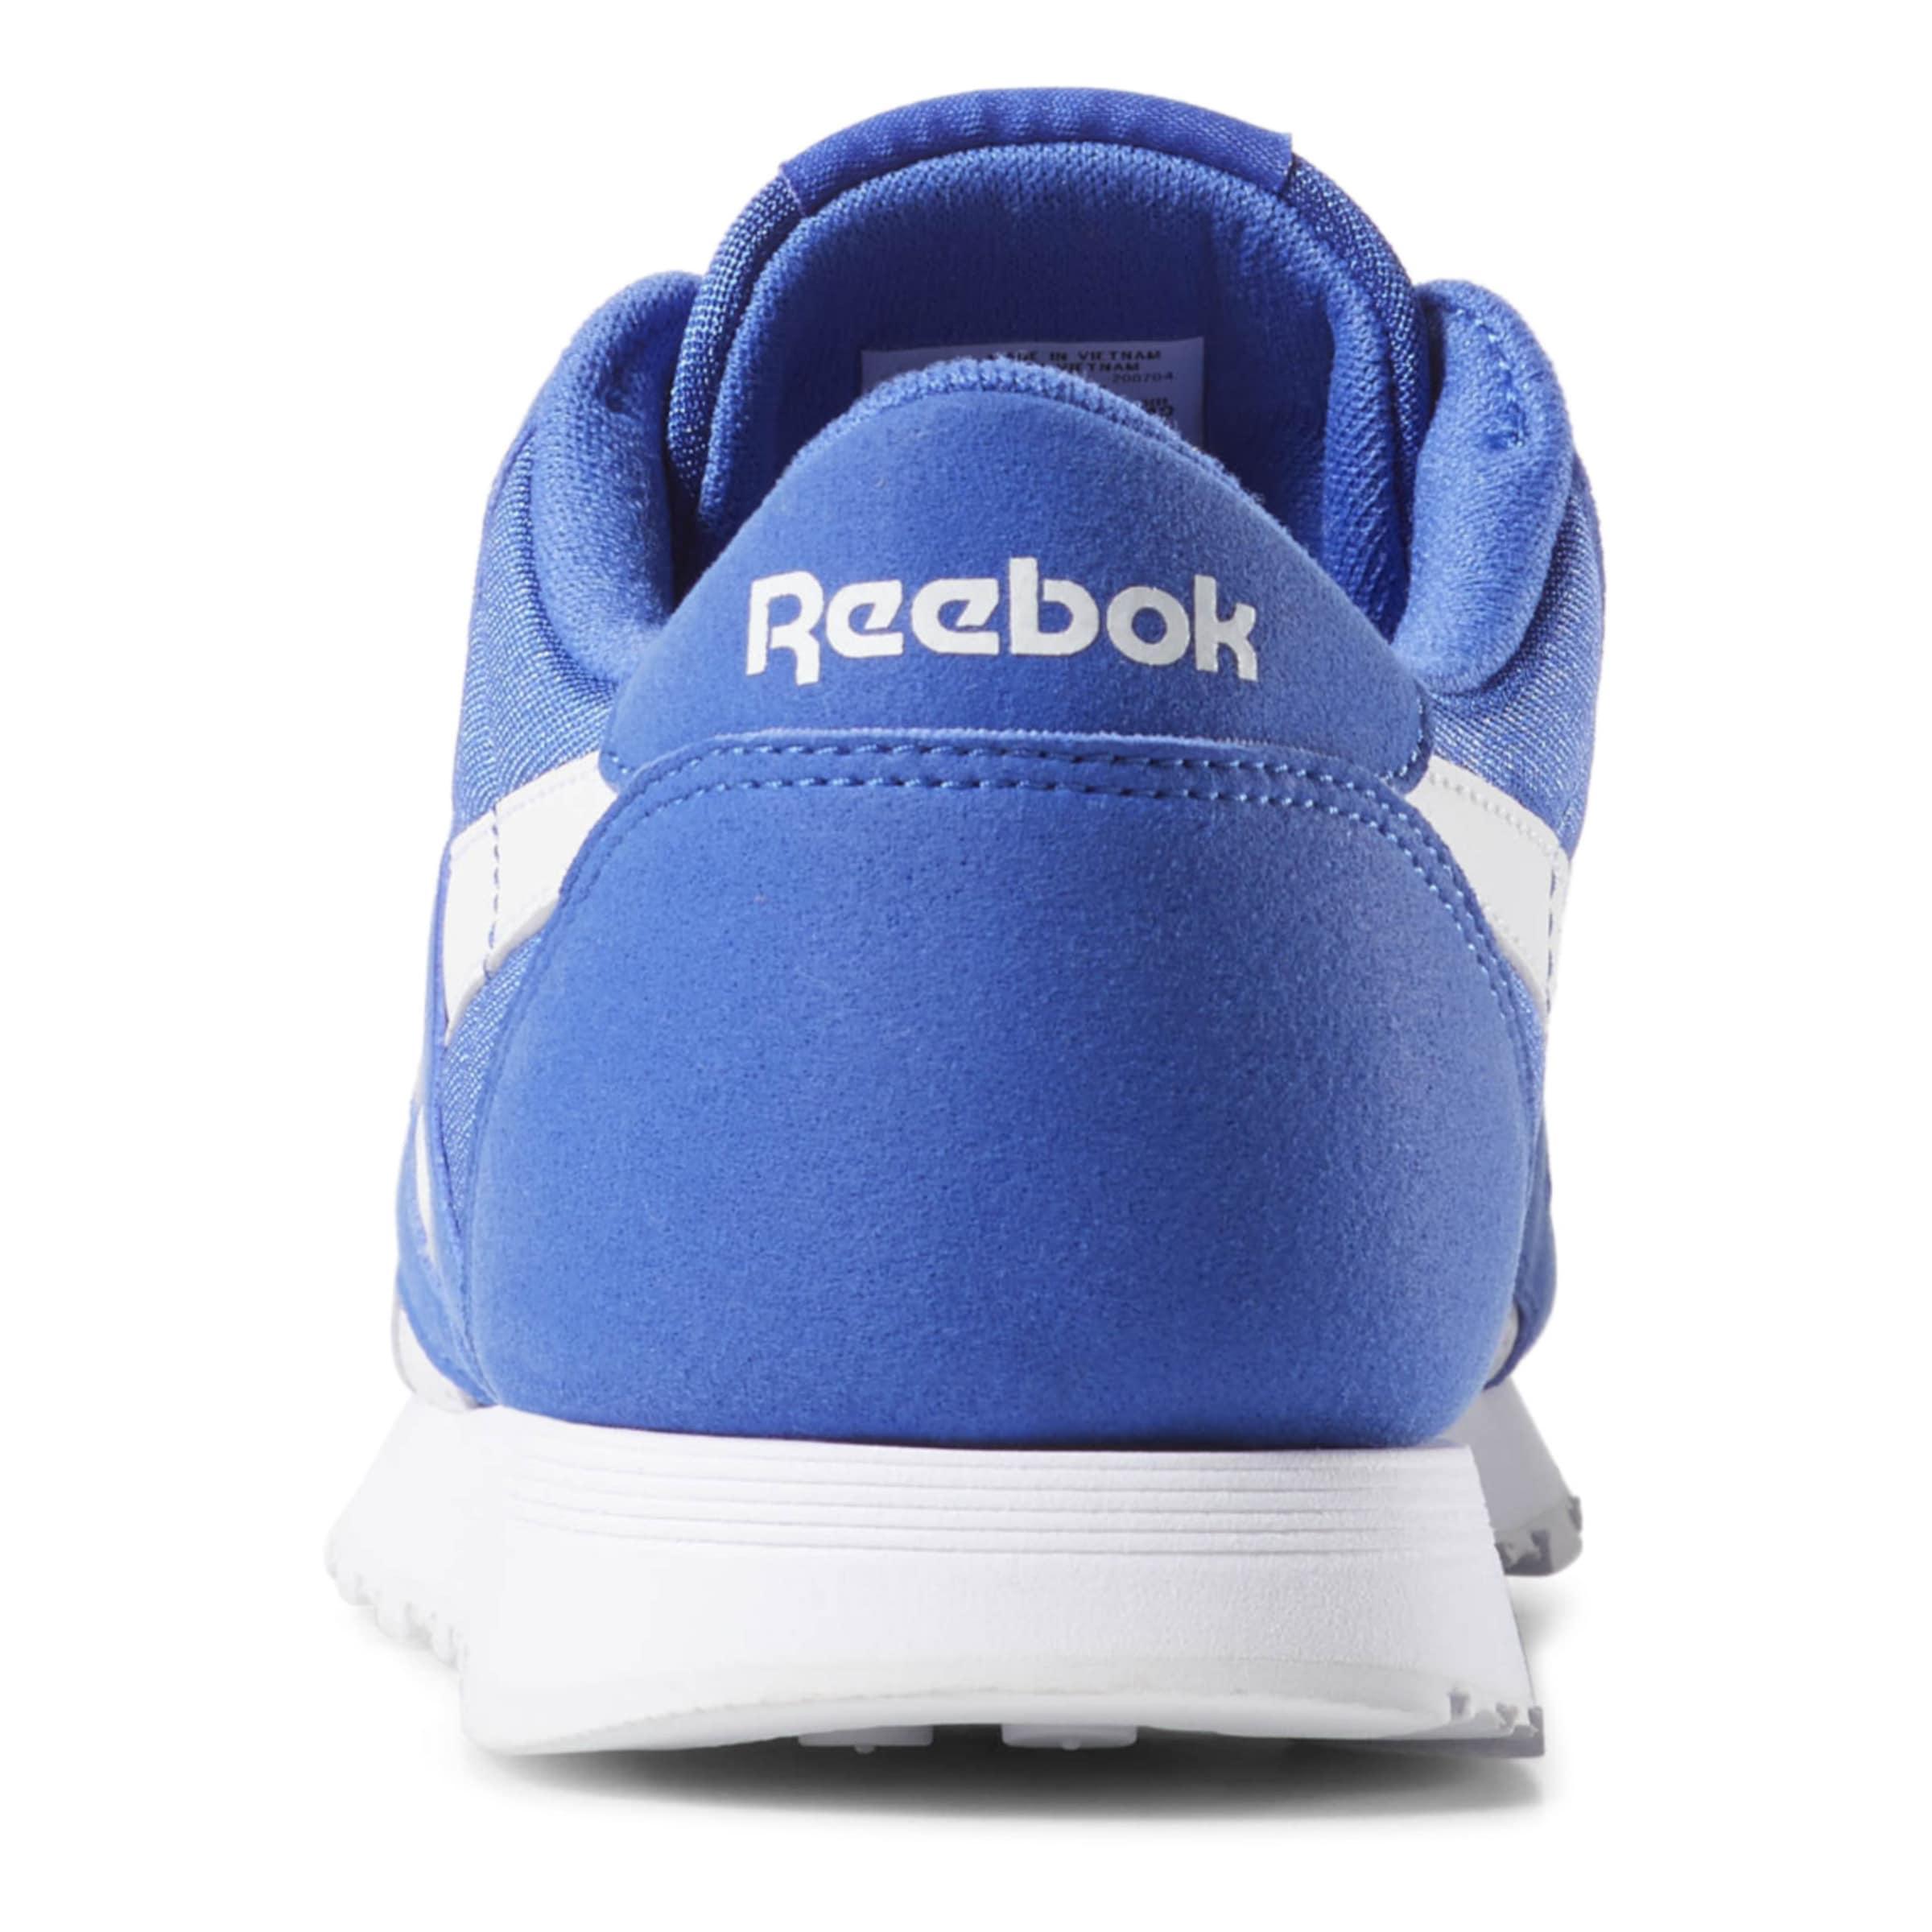 Reebok classic Schuhe Nylon, Nylon, Nylon, Leder Billige Herren- und Damenschuhe 96fed7